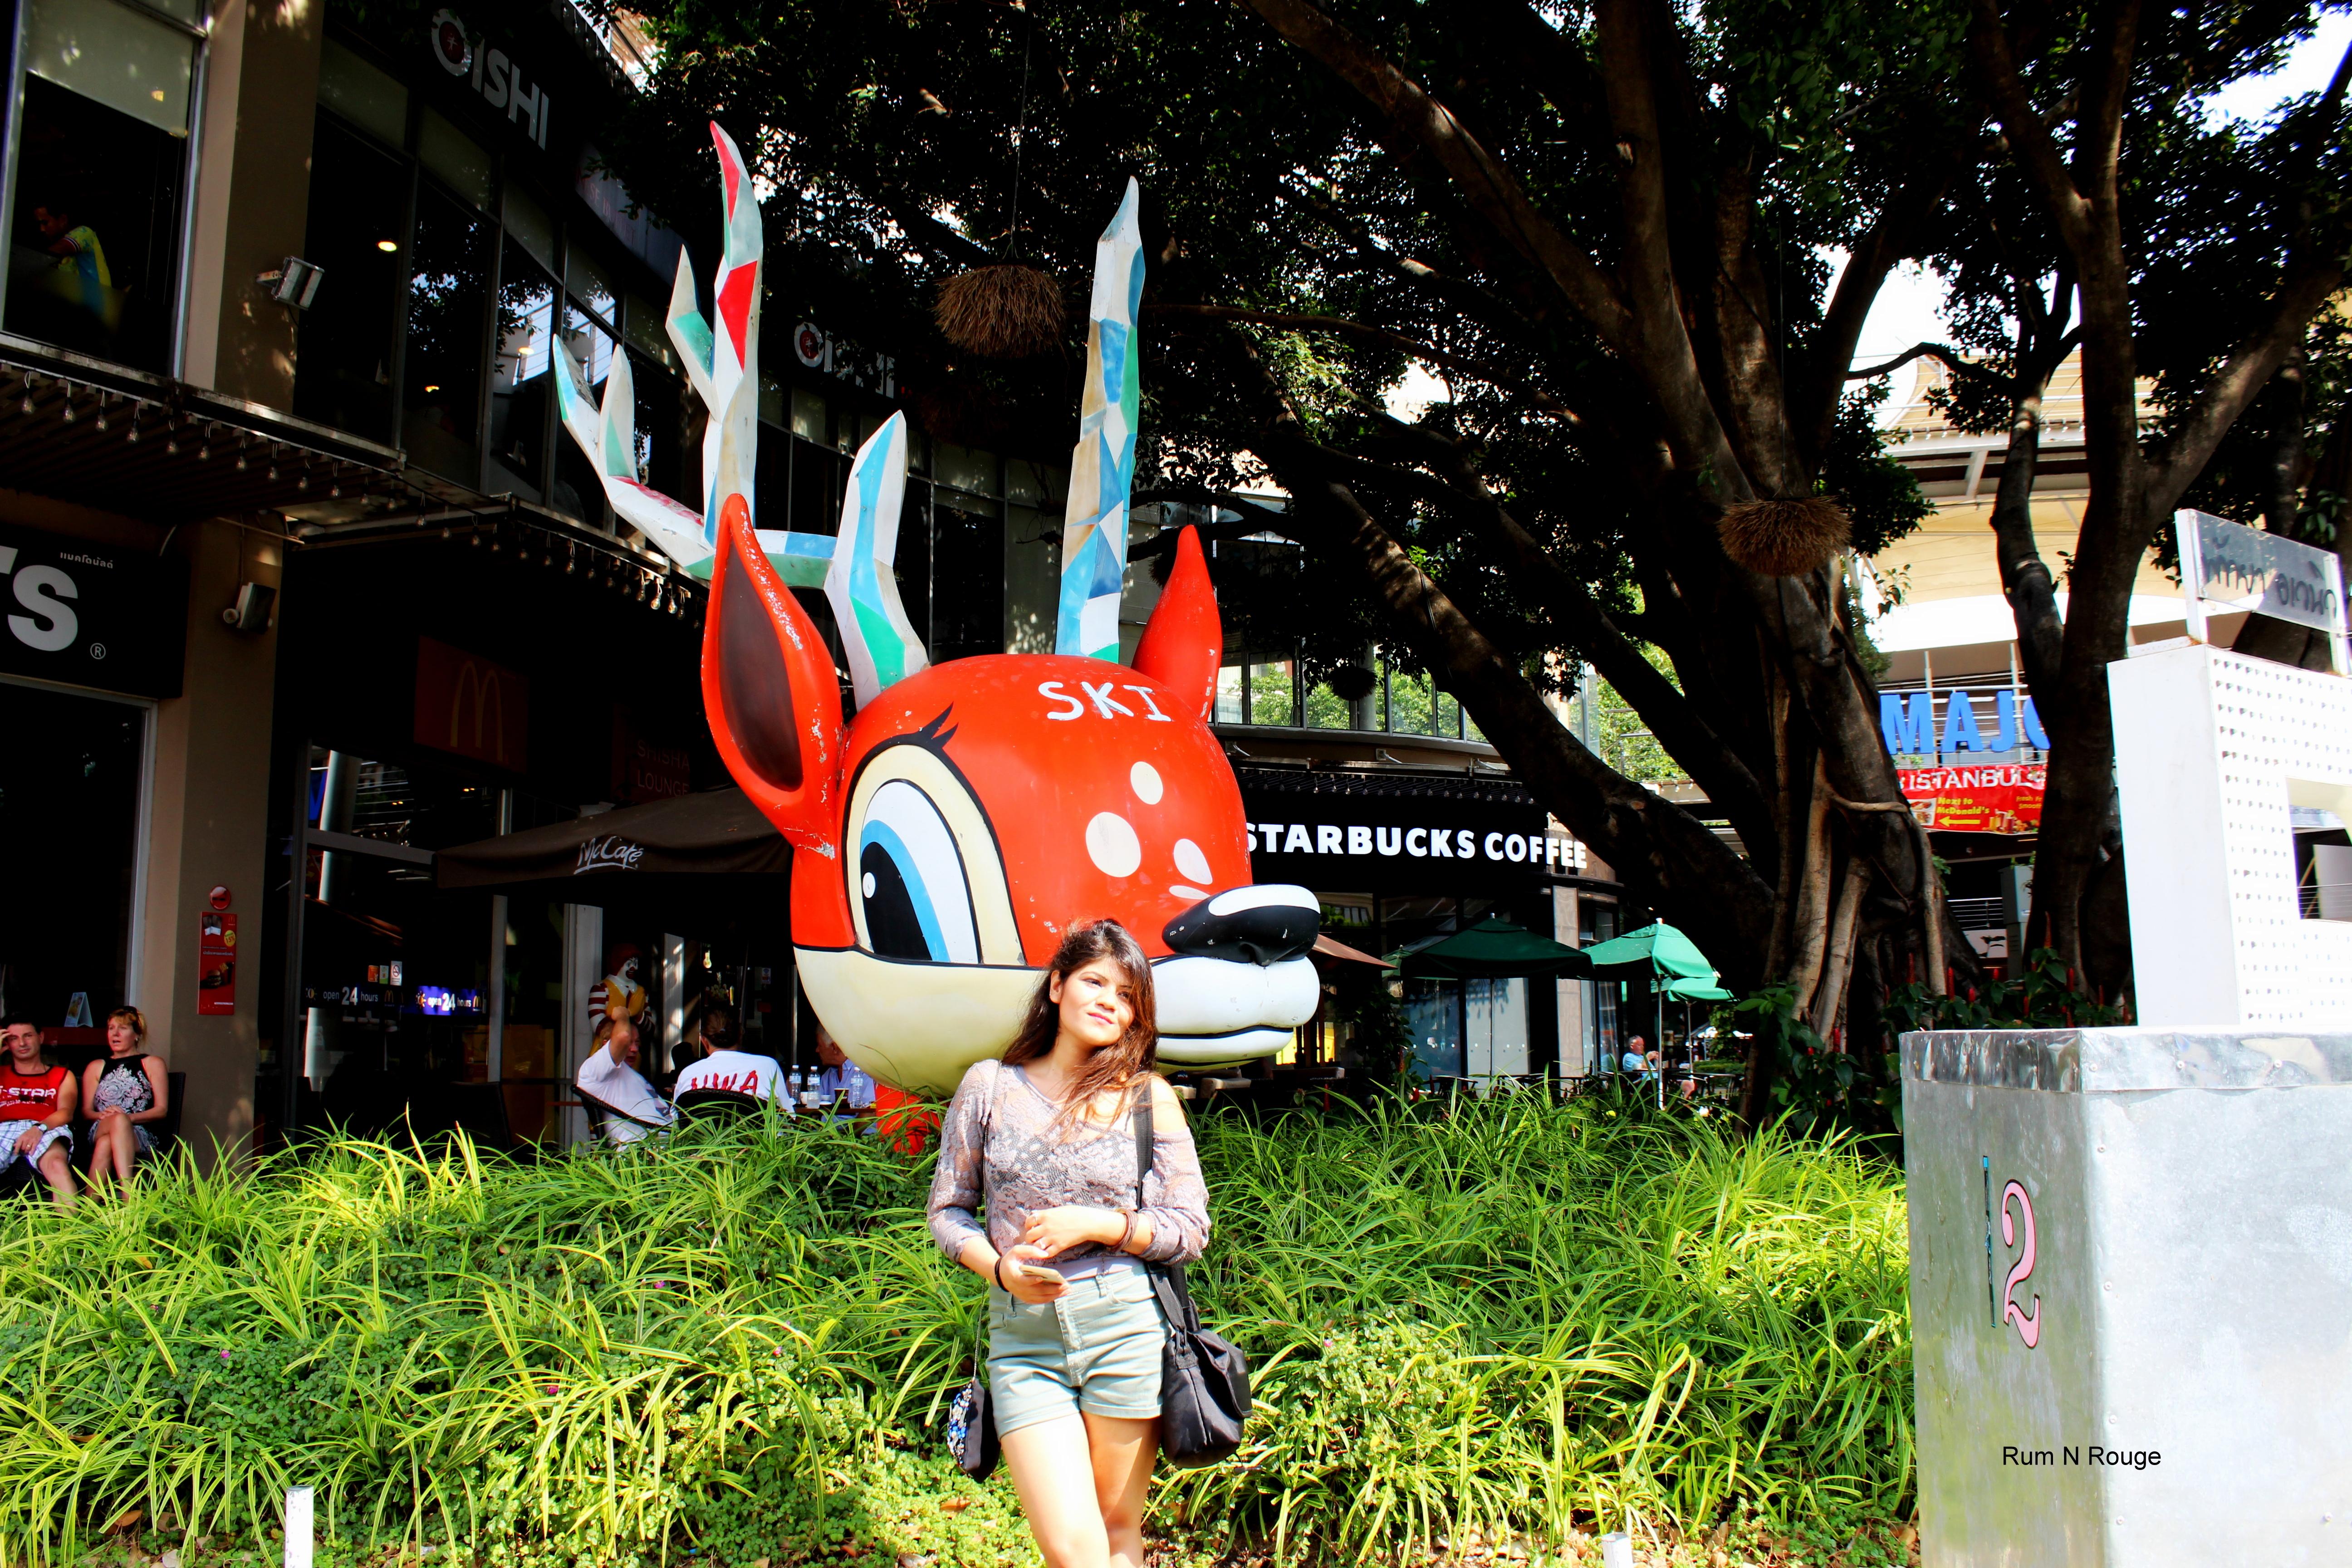 Rum N Rouge's Trip to Thailand Part – 2